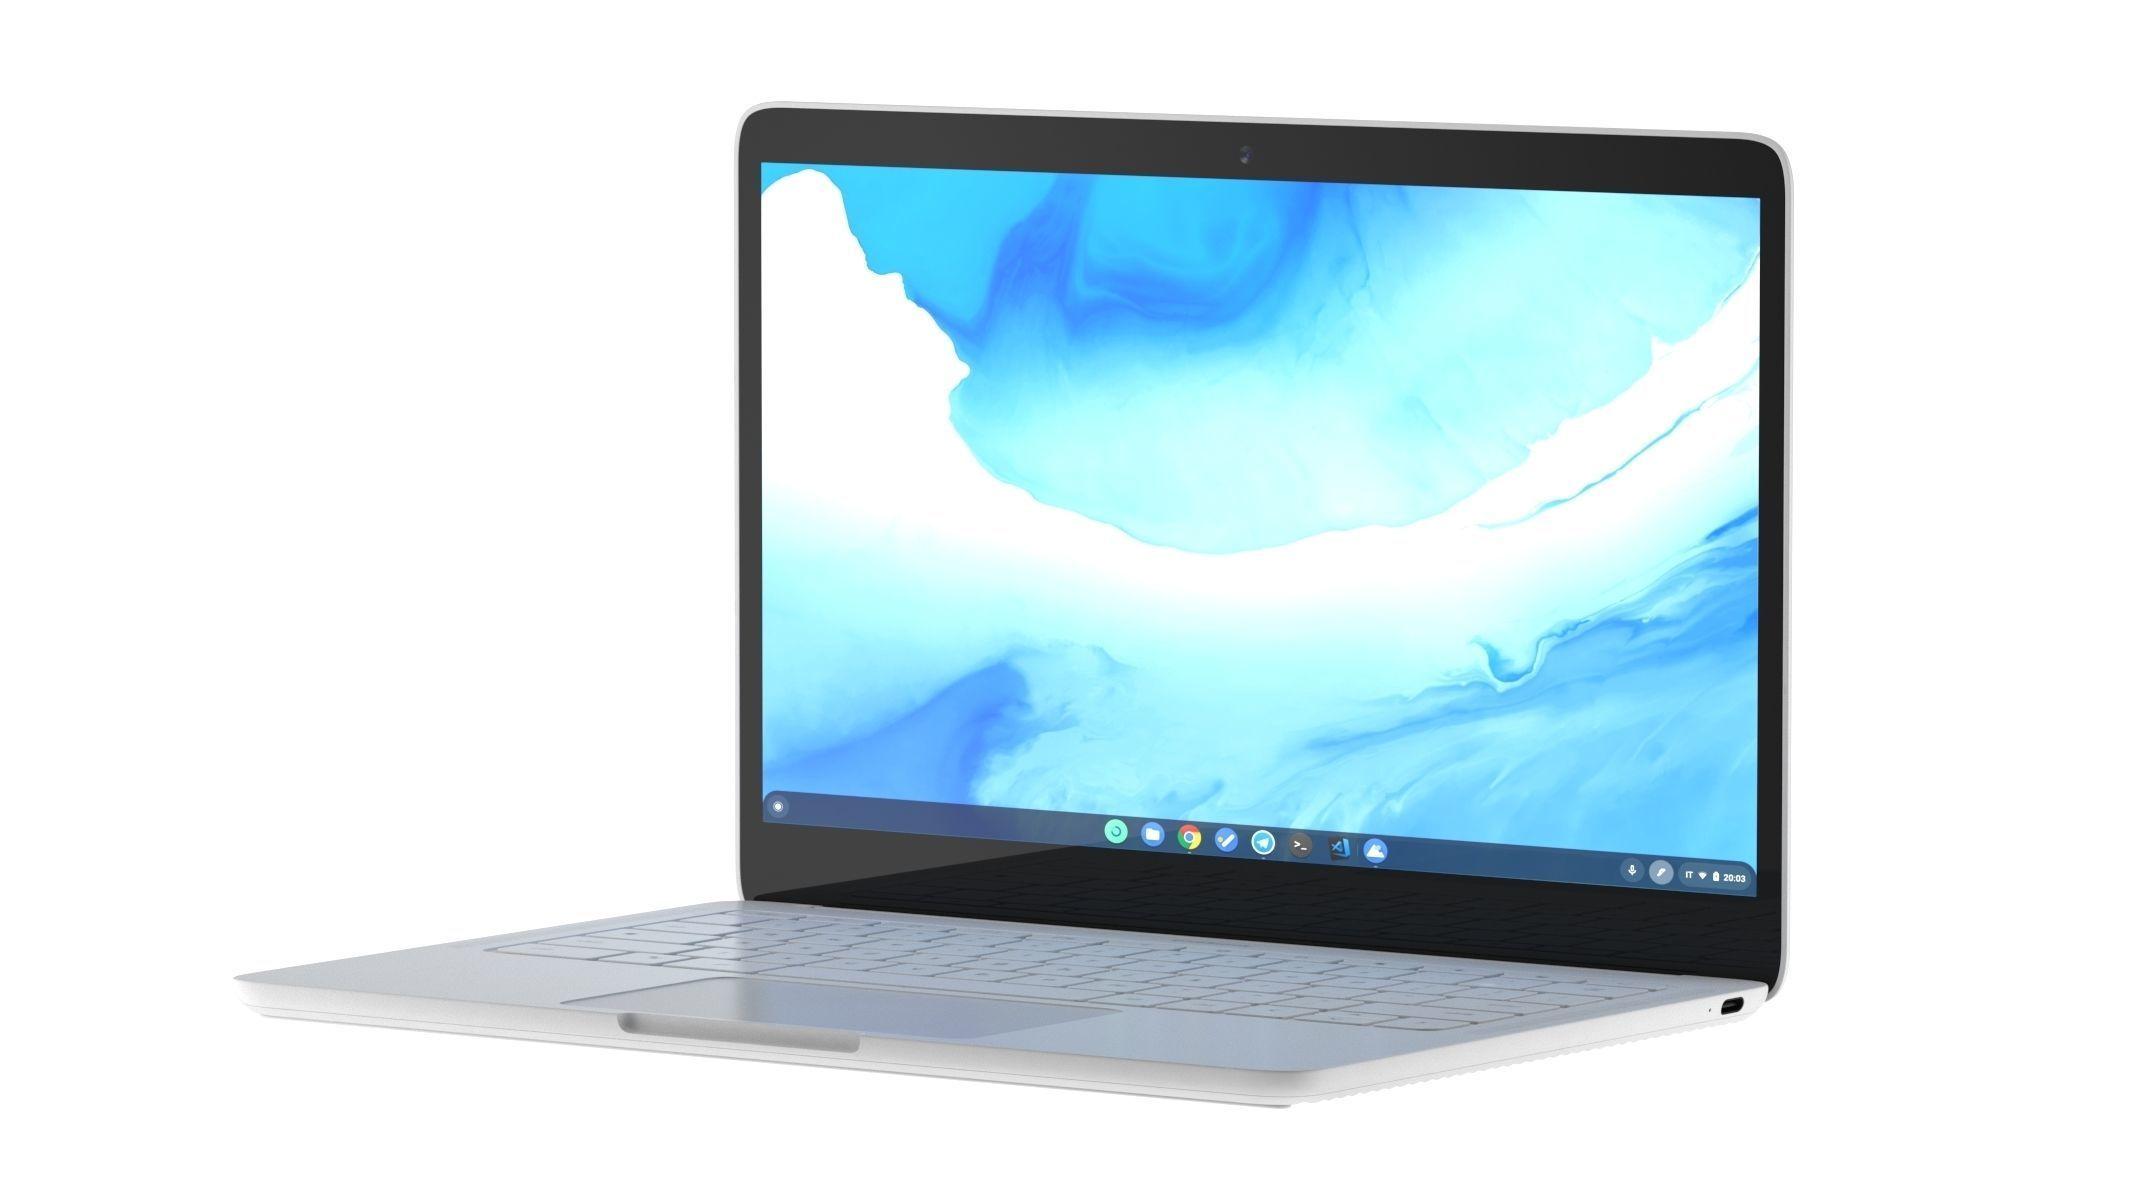 laptop computer model cgtrader